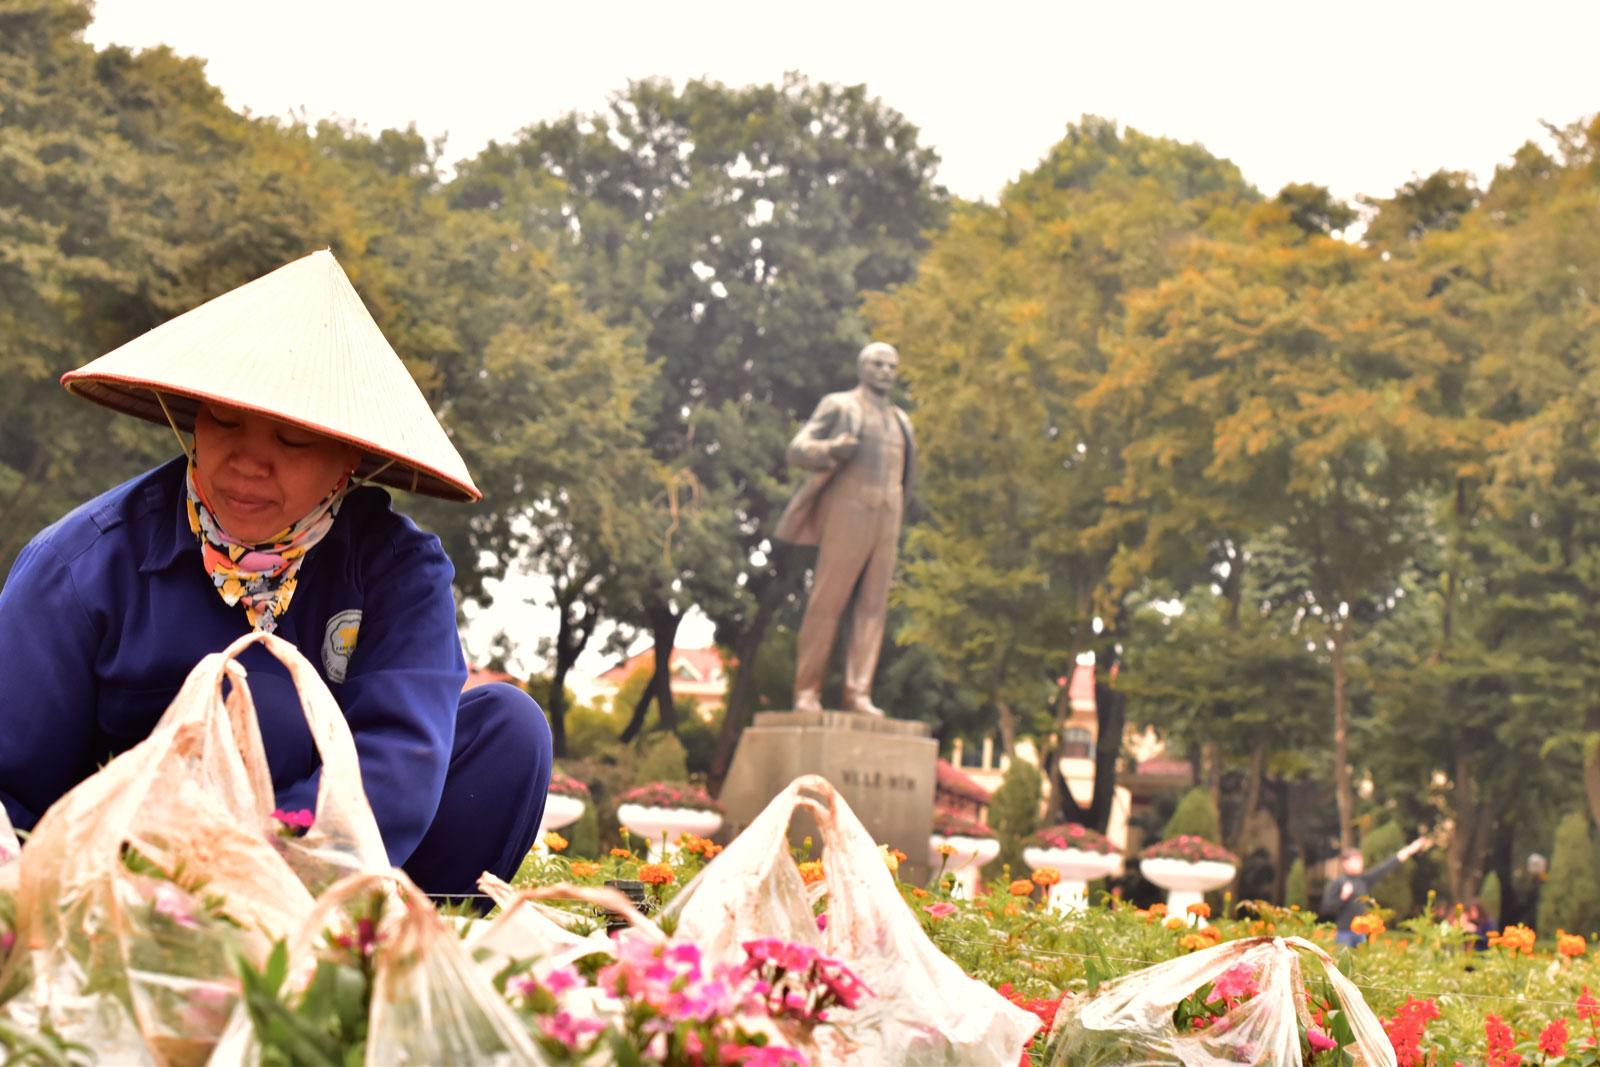 Despite Vietnam's success in attracting capitalist investors, this statue of Lenin is a landmark in capital Hanoi. Photo: Simon Roughneen